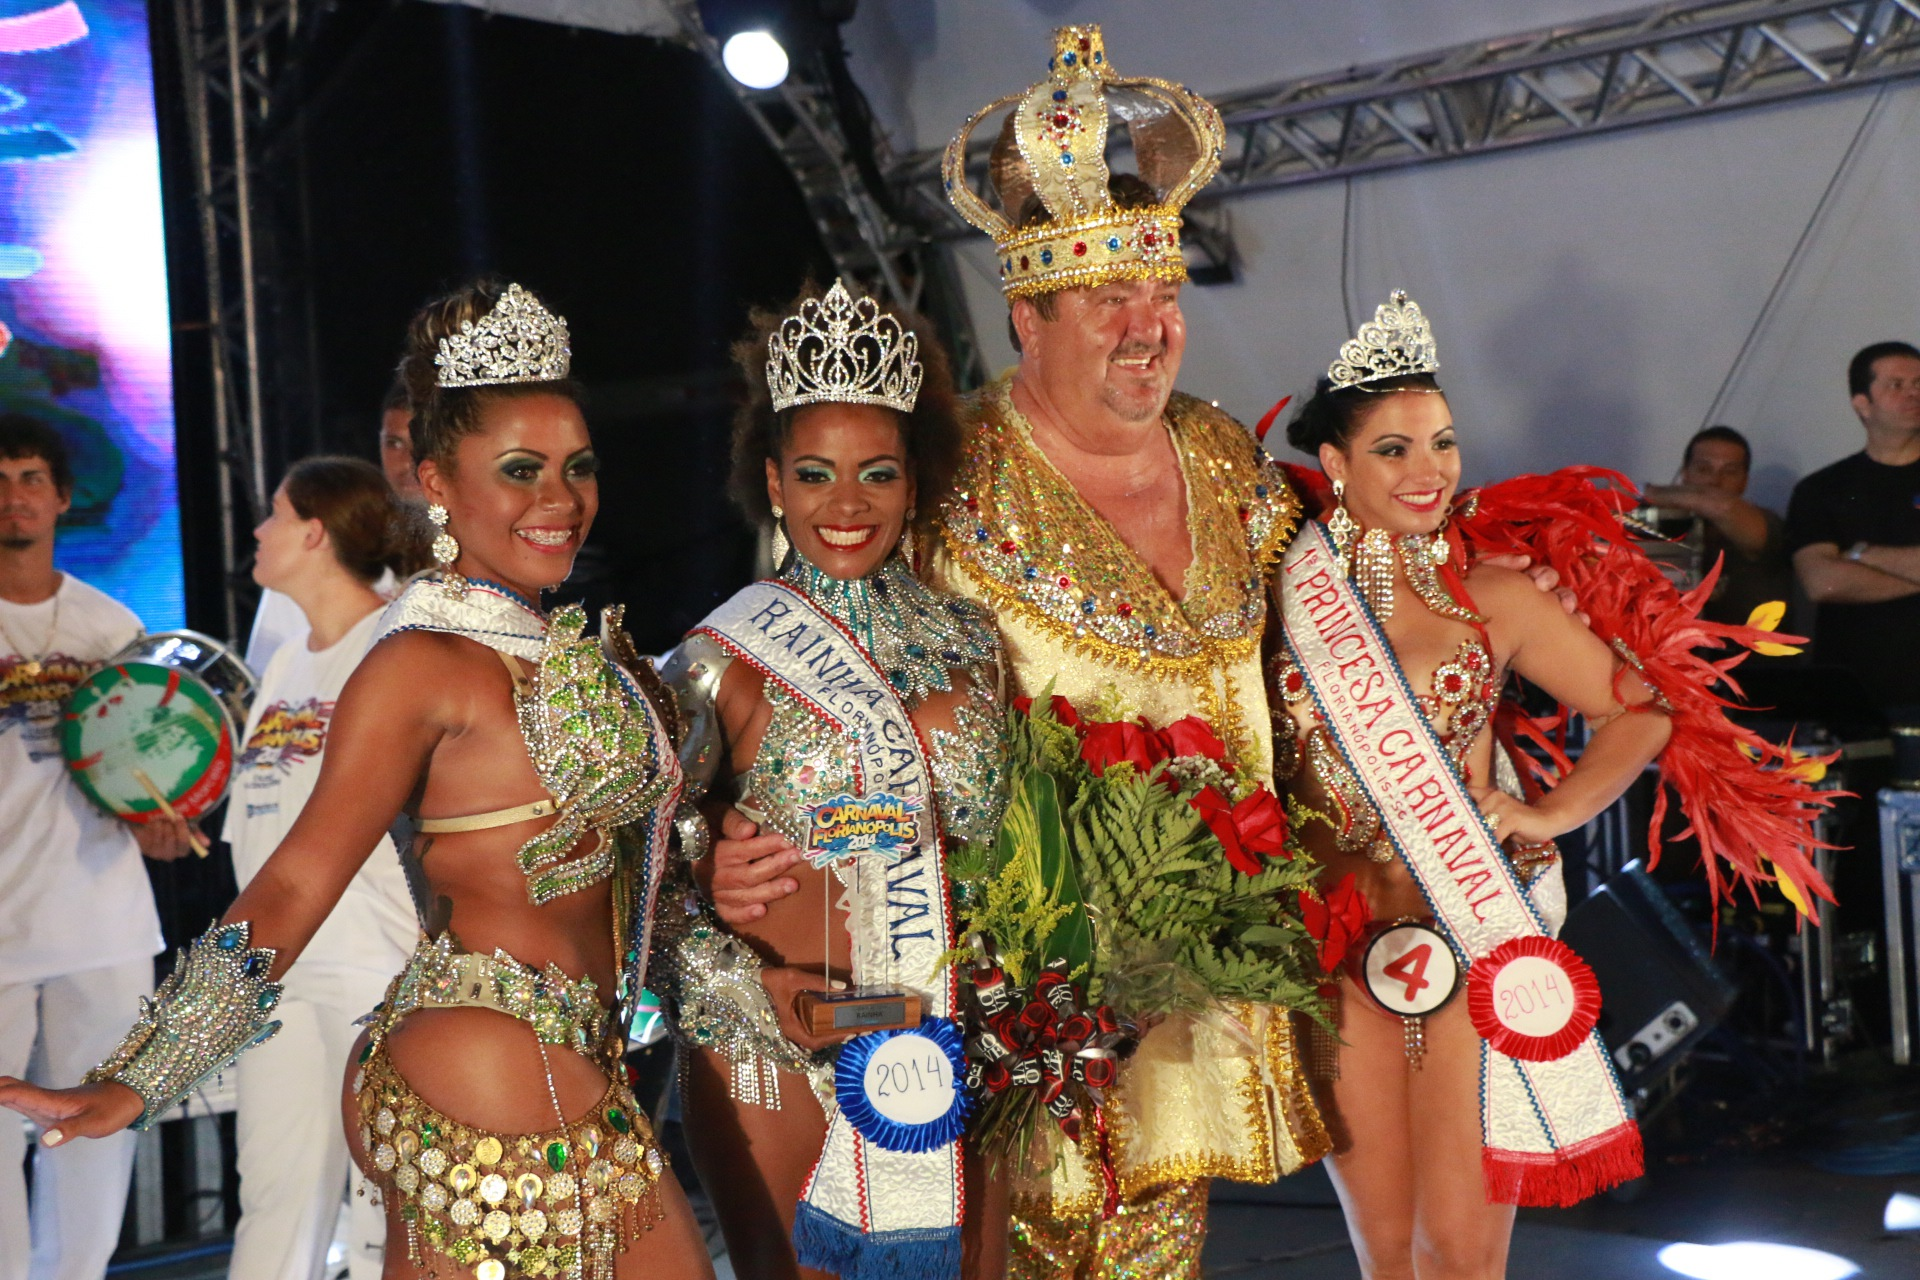 Realeza 2014: 2ª princesa Fernanda Vieira, rainha Letícia Mello, rei momo Hernani Hulk e 1ª princesa Greicy Rodrigues